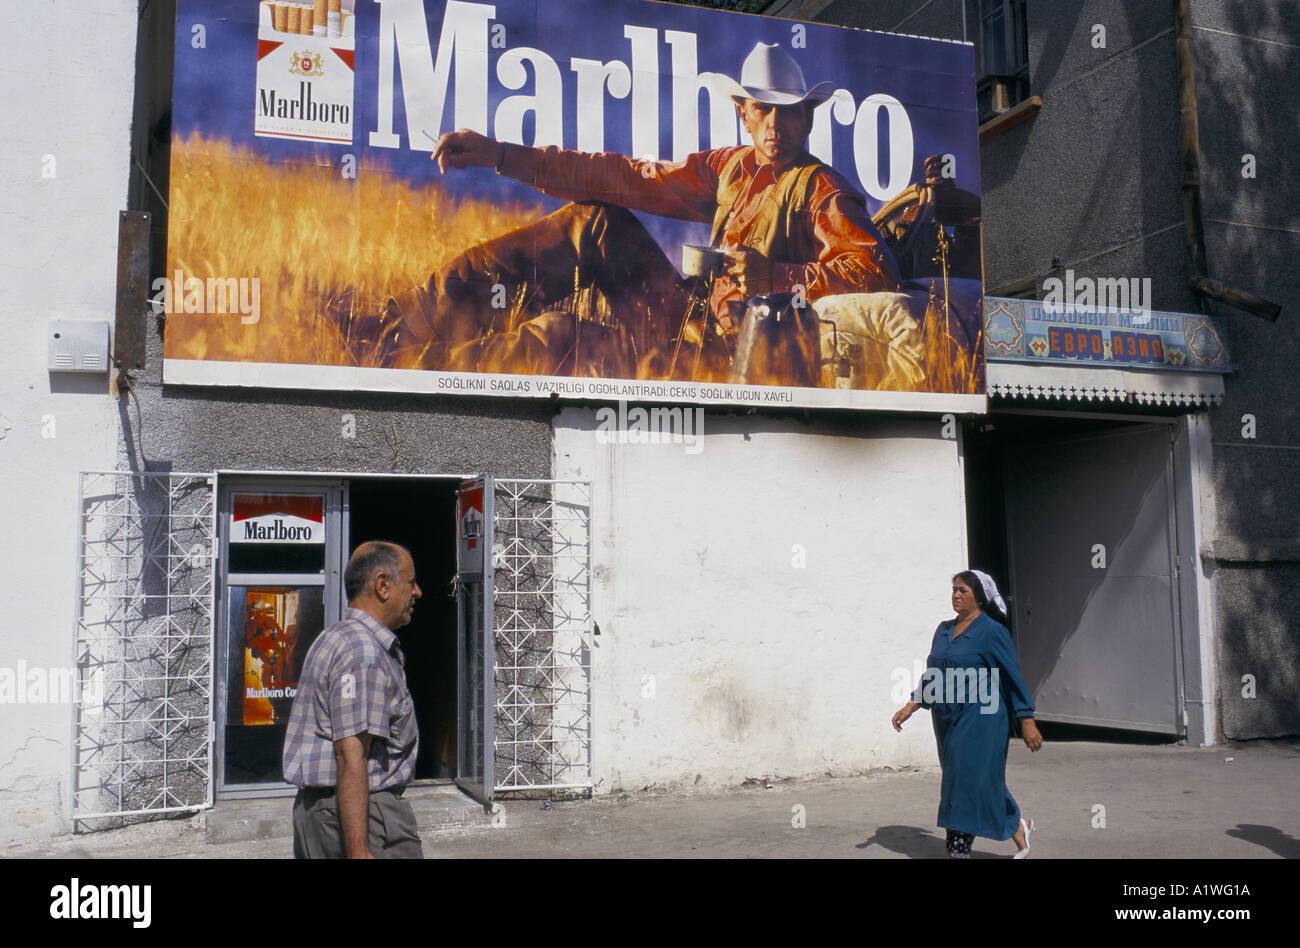 Man and women walking in front of a Marlboro advert, Tajikistan - Stock Image